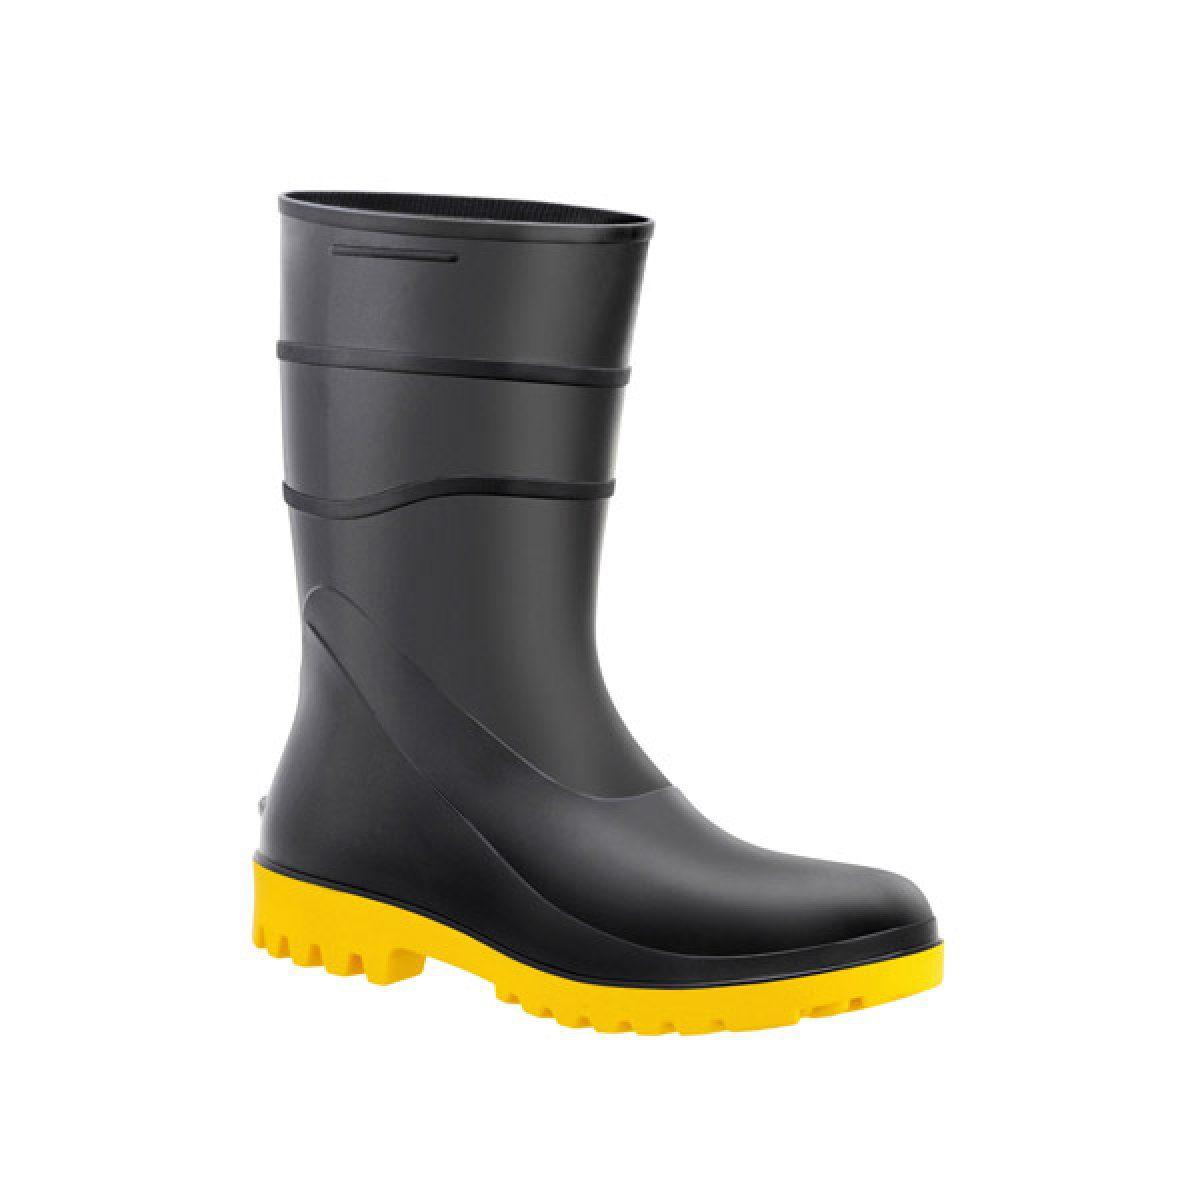 Bota de PVC Preta c/ Solado Amarelo N°41 - BRACOL